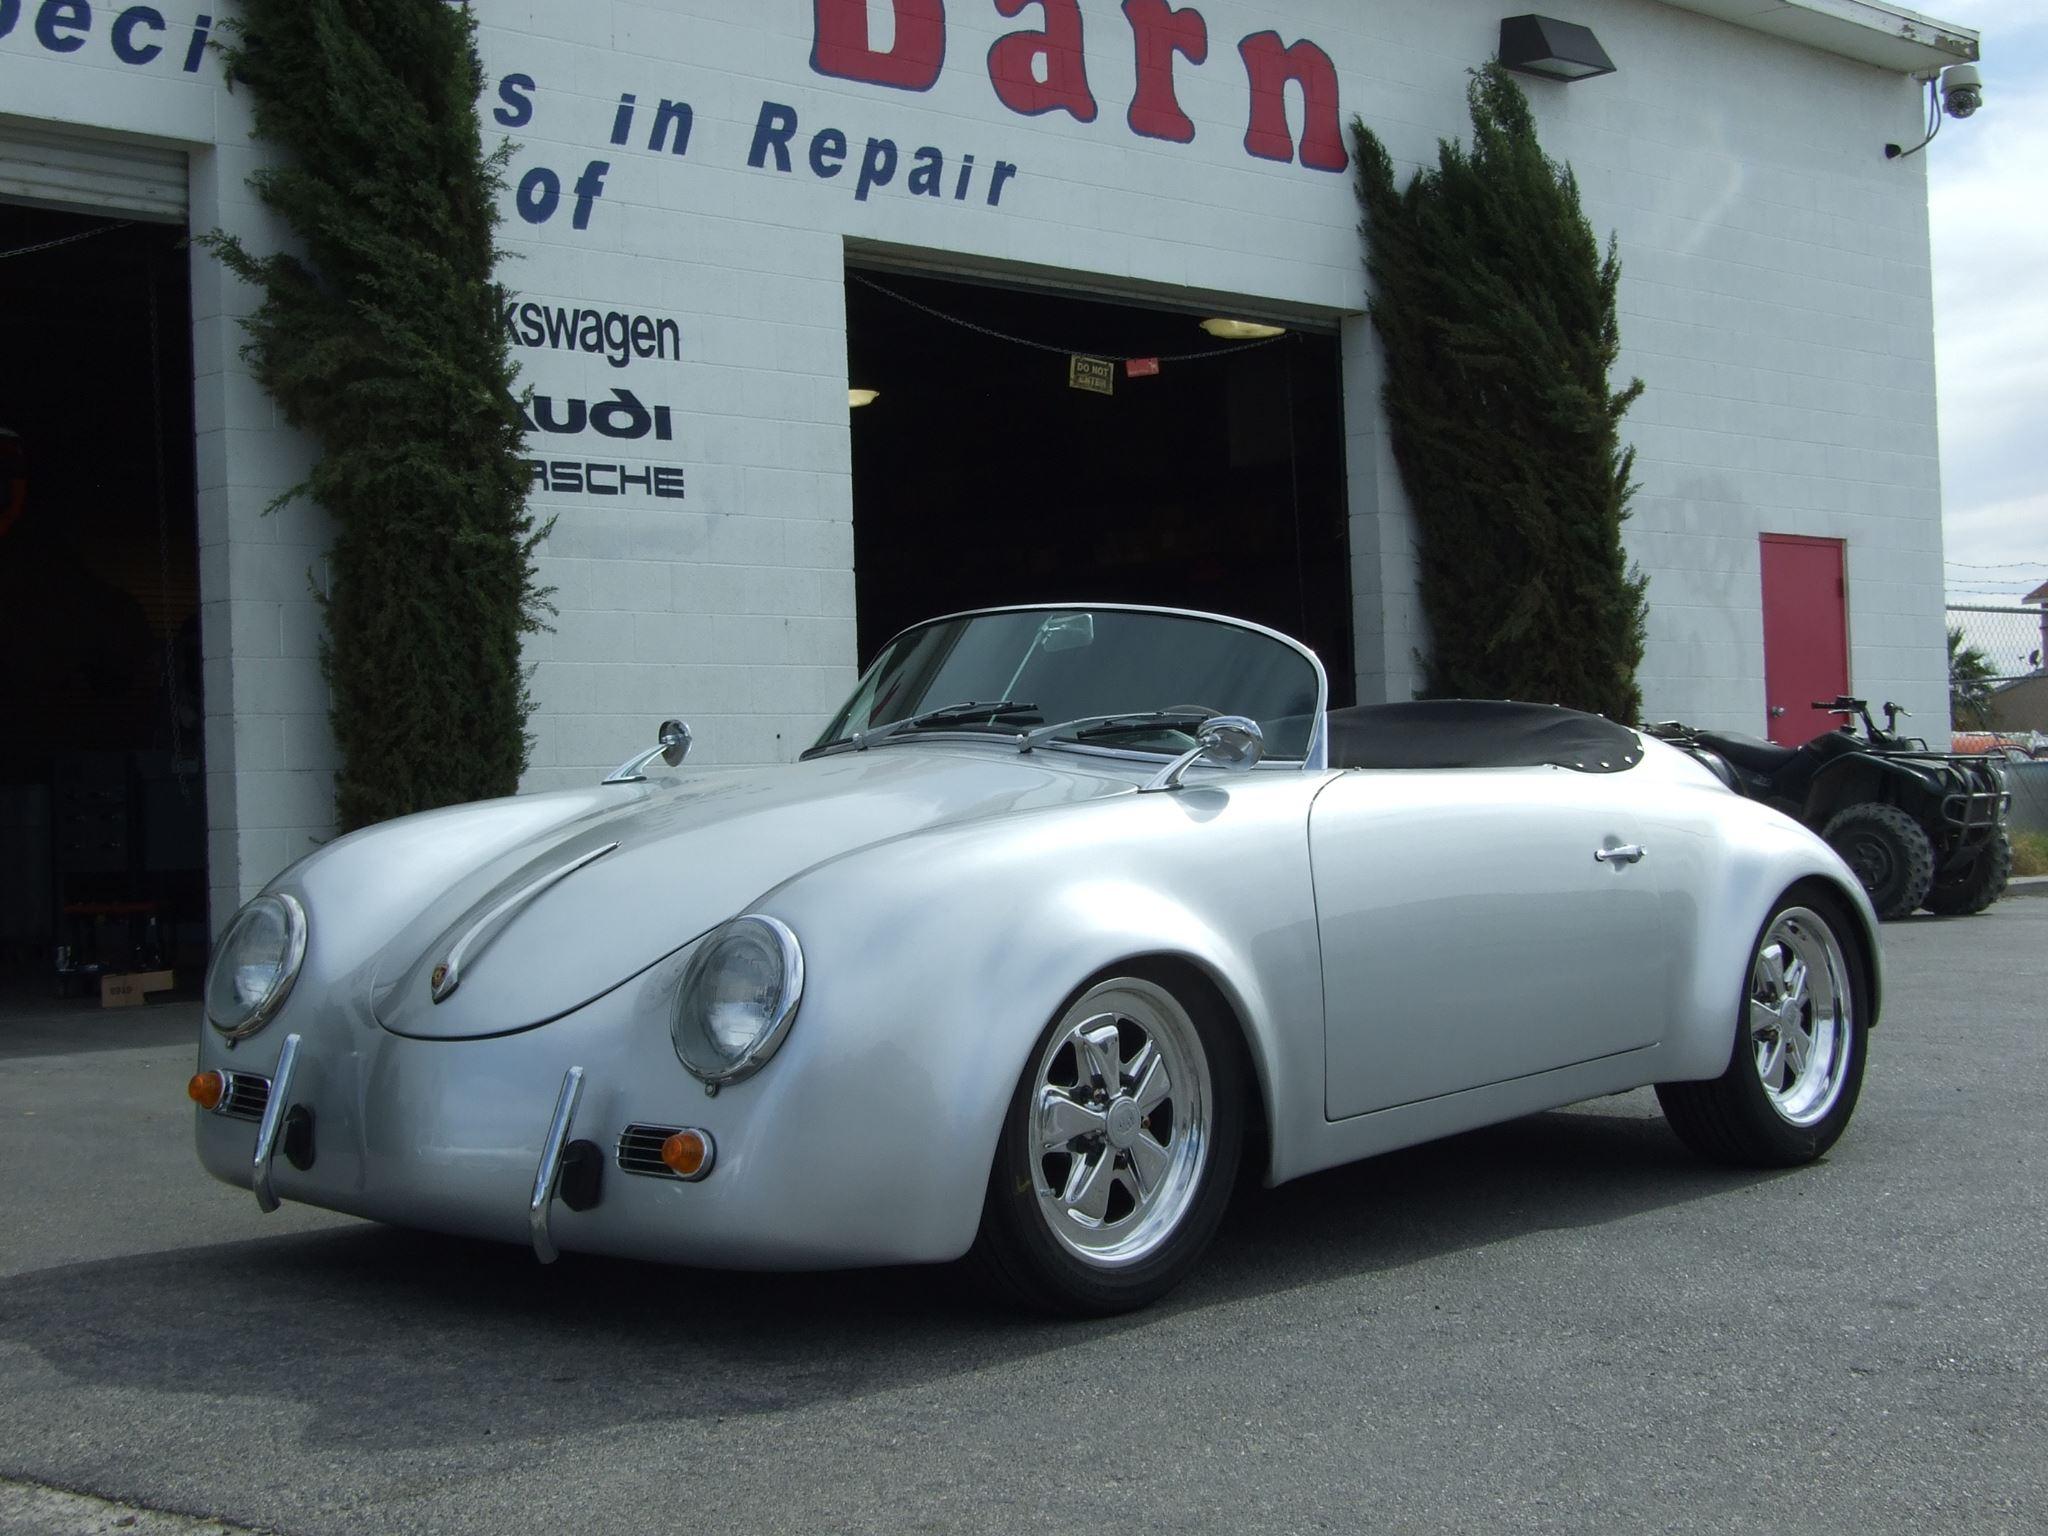 Car repair services-German brands-Beetle Barn 702-459-8691